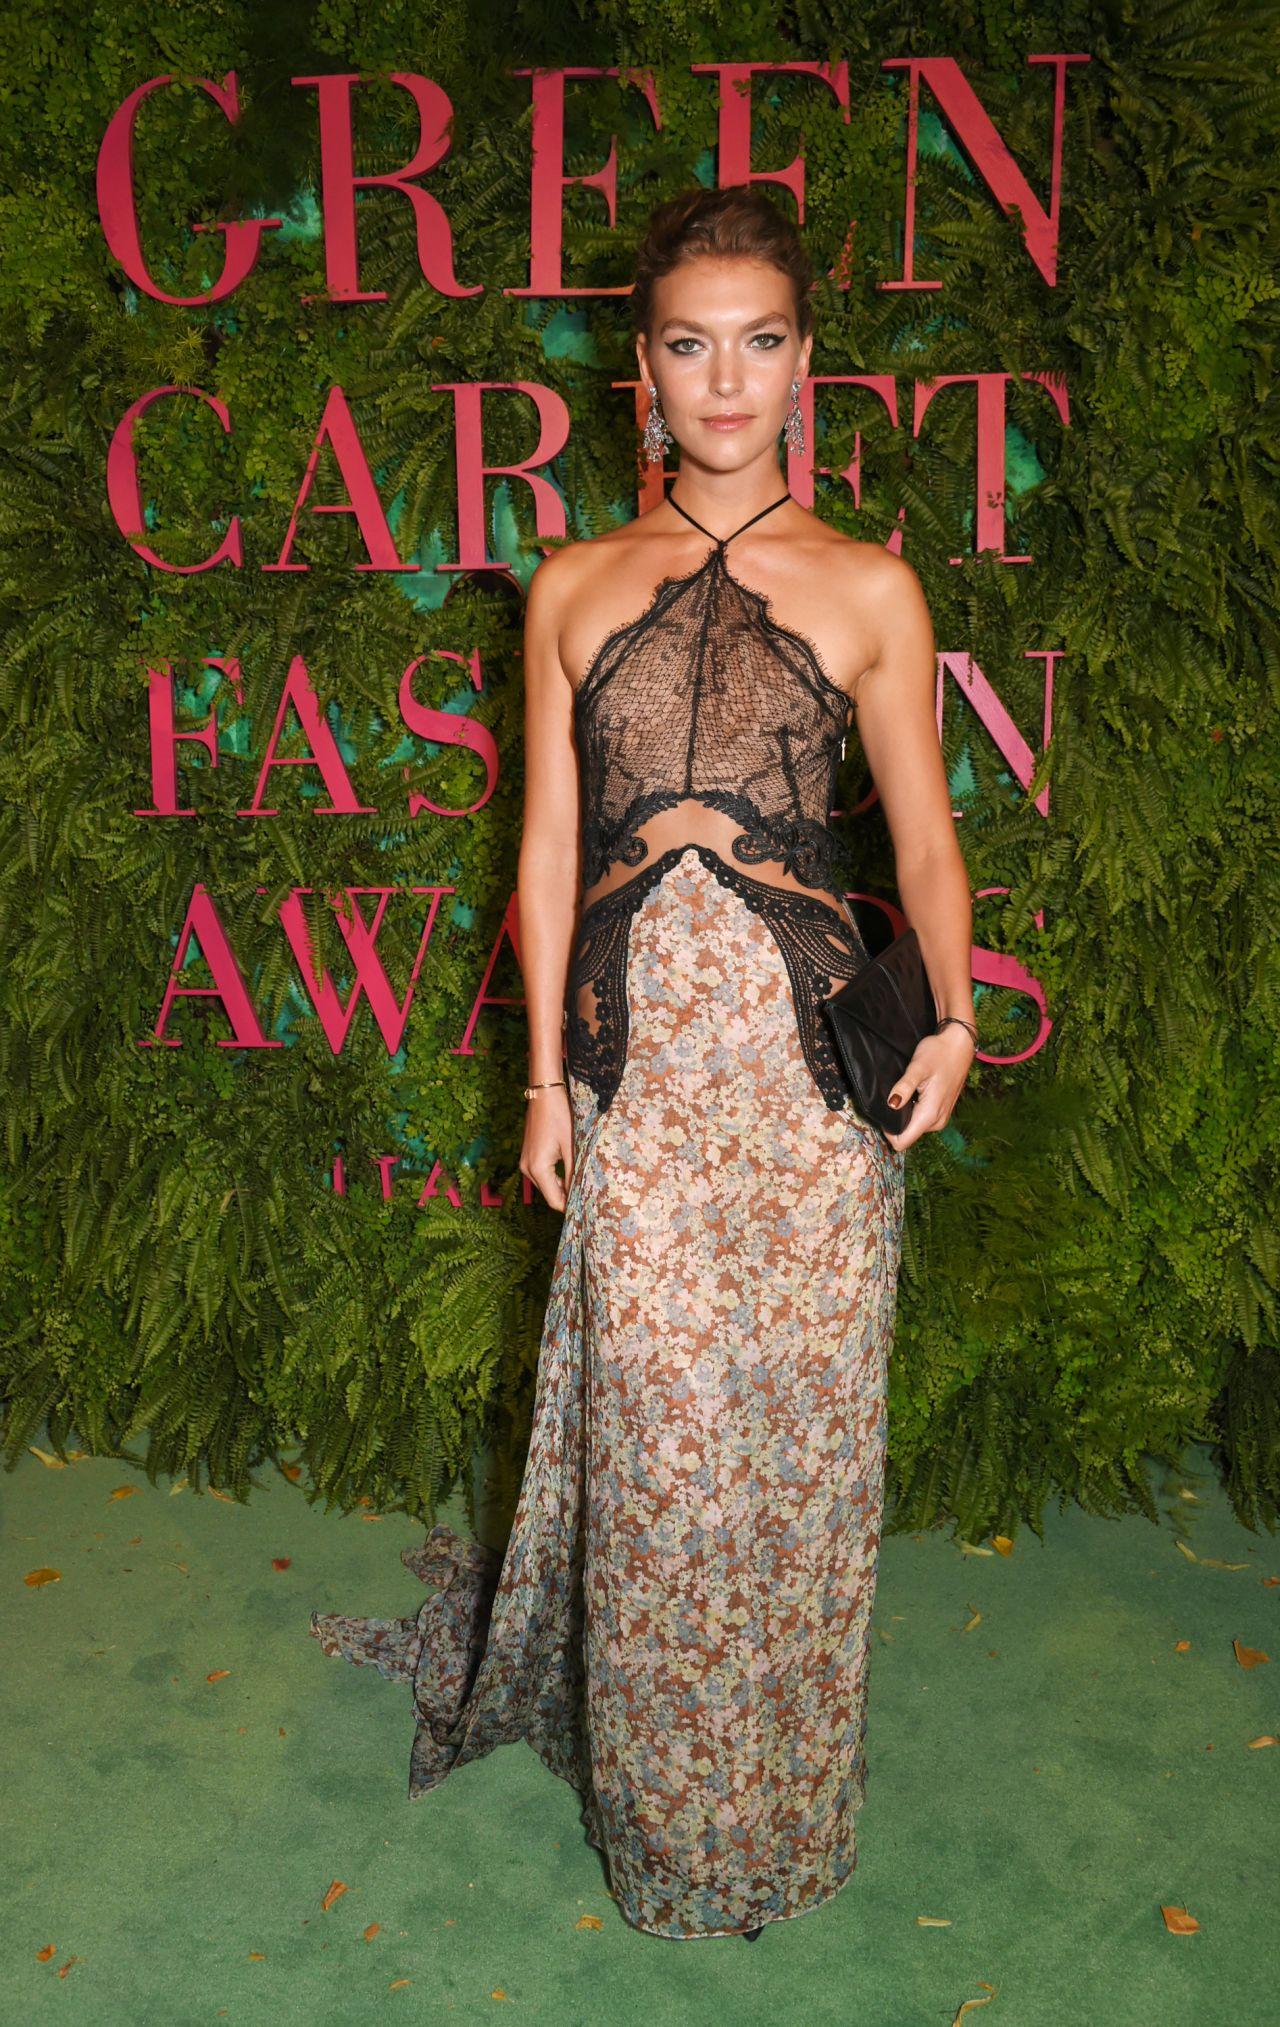 Arizona Muse Green Carpet Fashion Awards Italia 2017